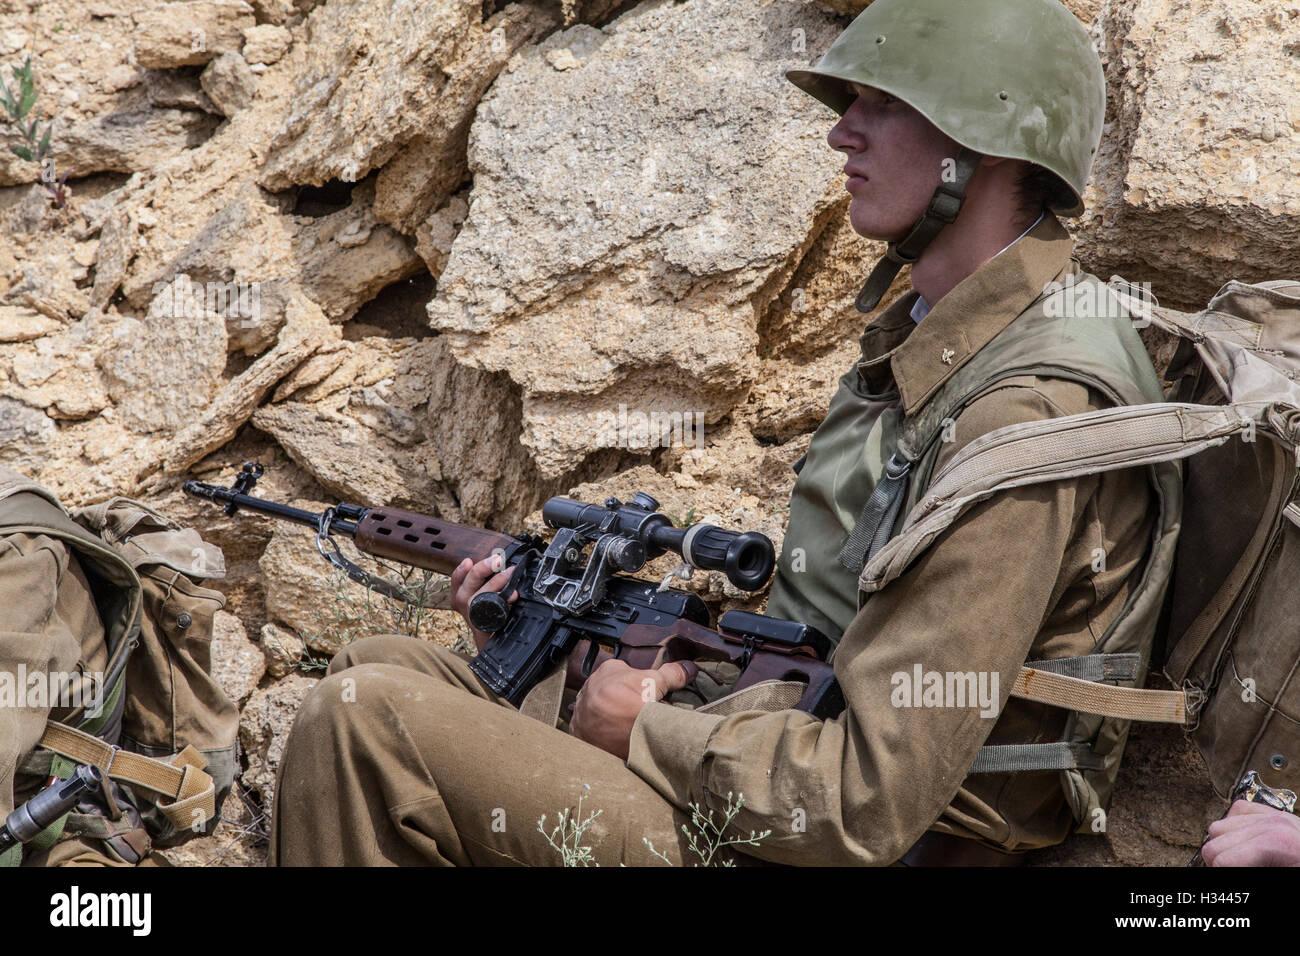 Soviet Afghanistan war - Page 6 Soviet-spetsnaz-in-afghanistan-H34457